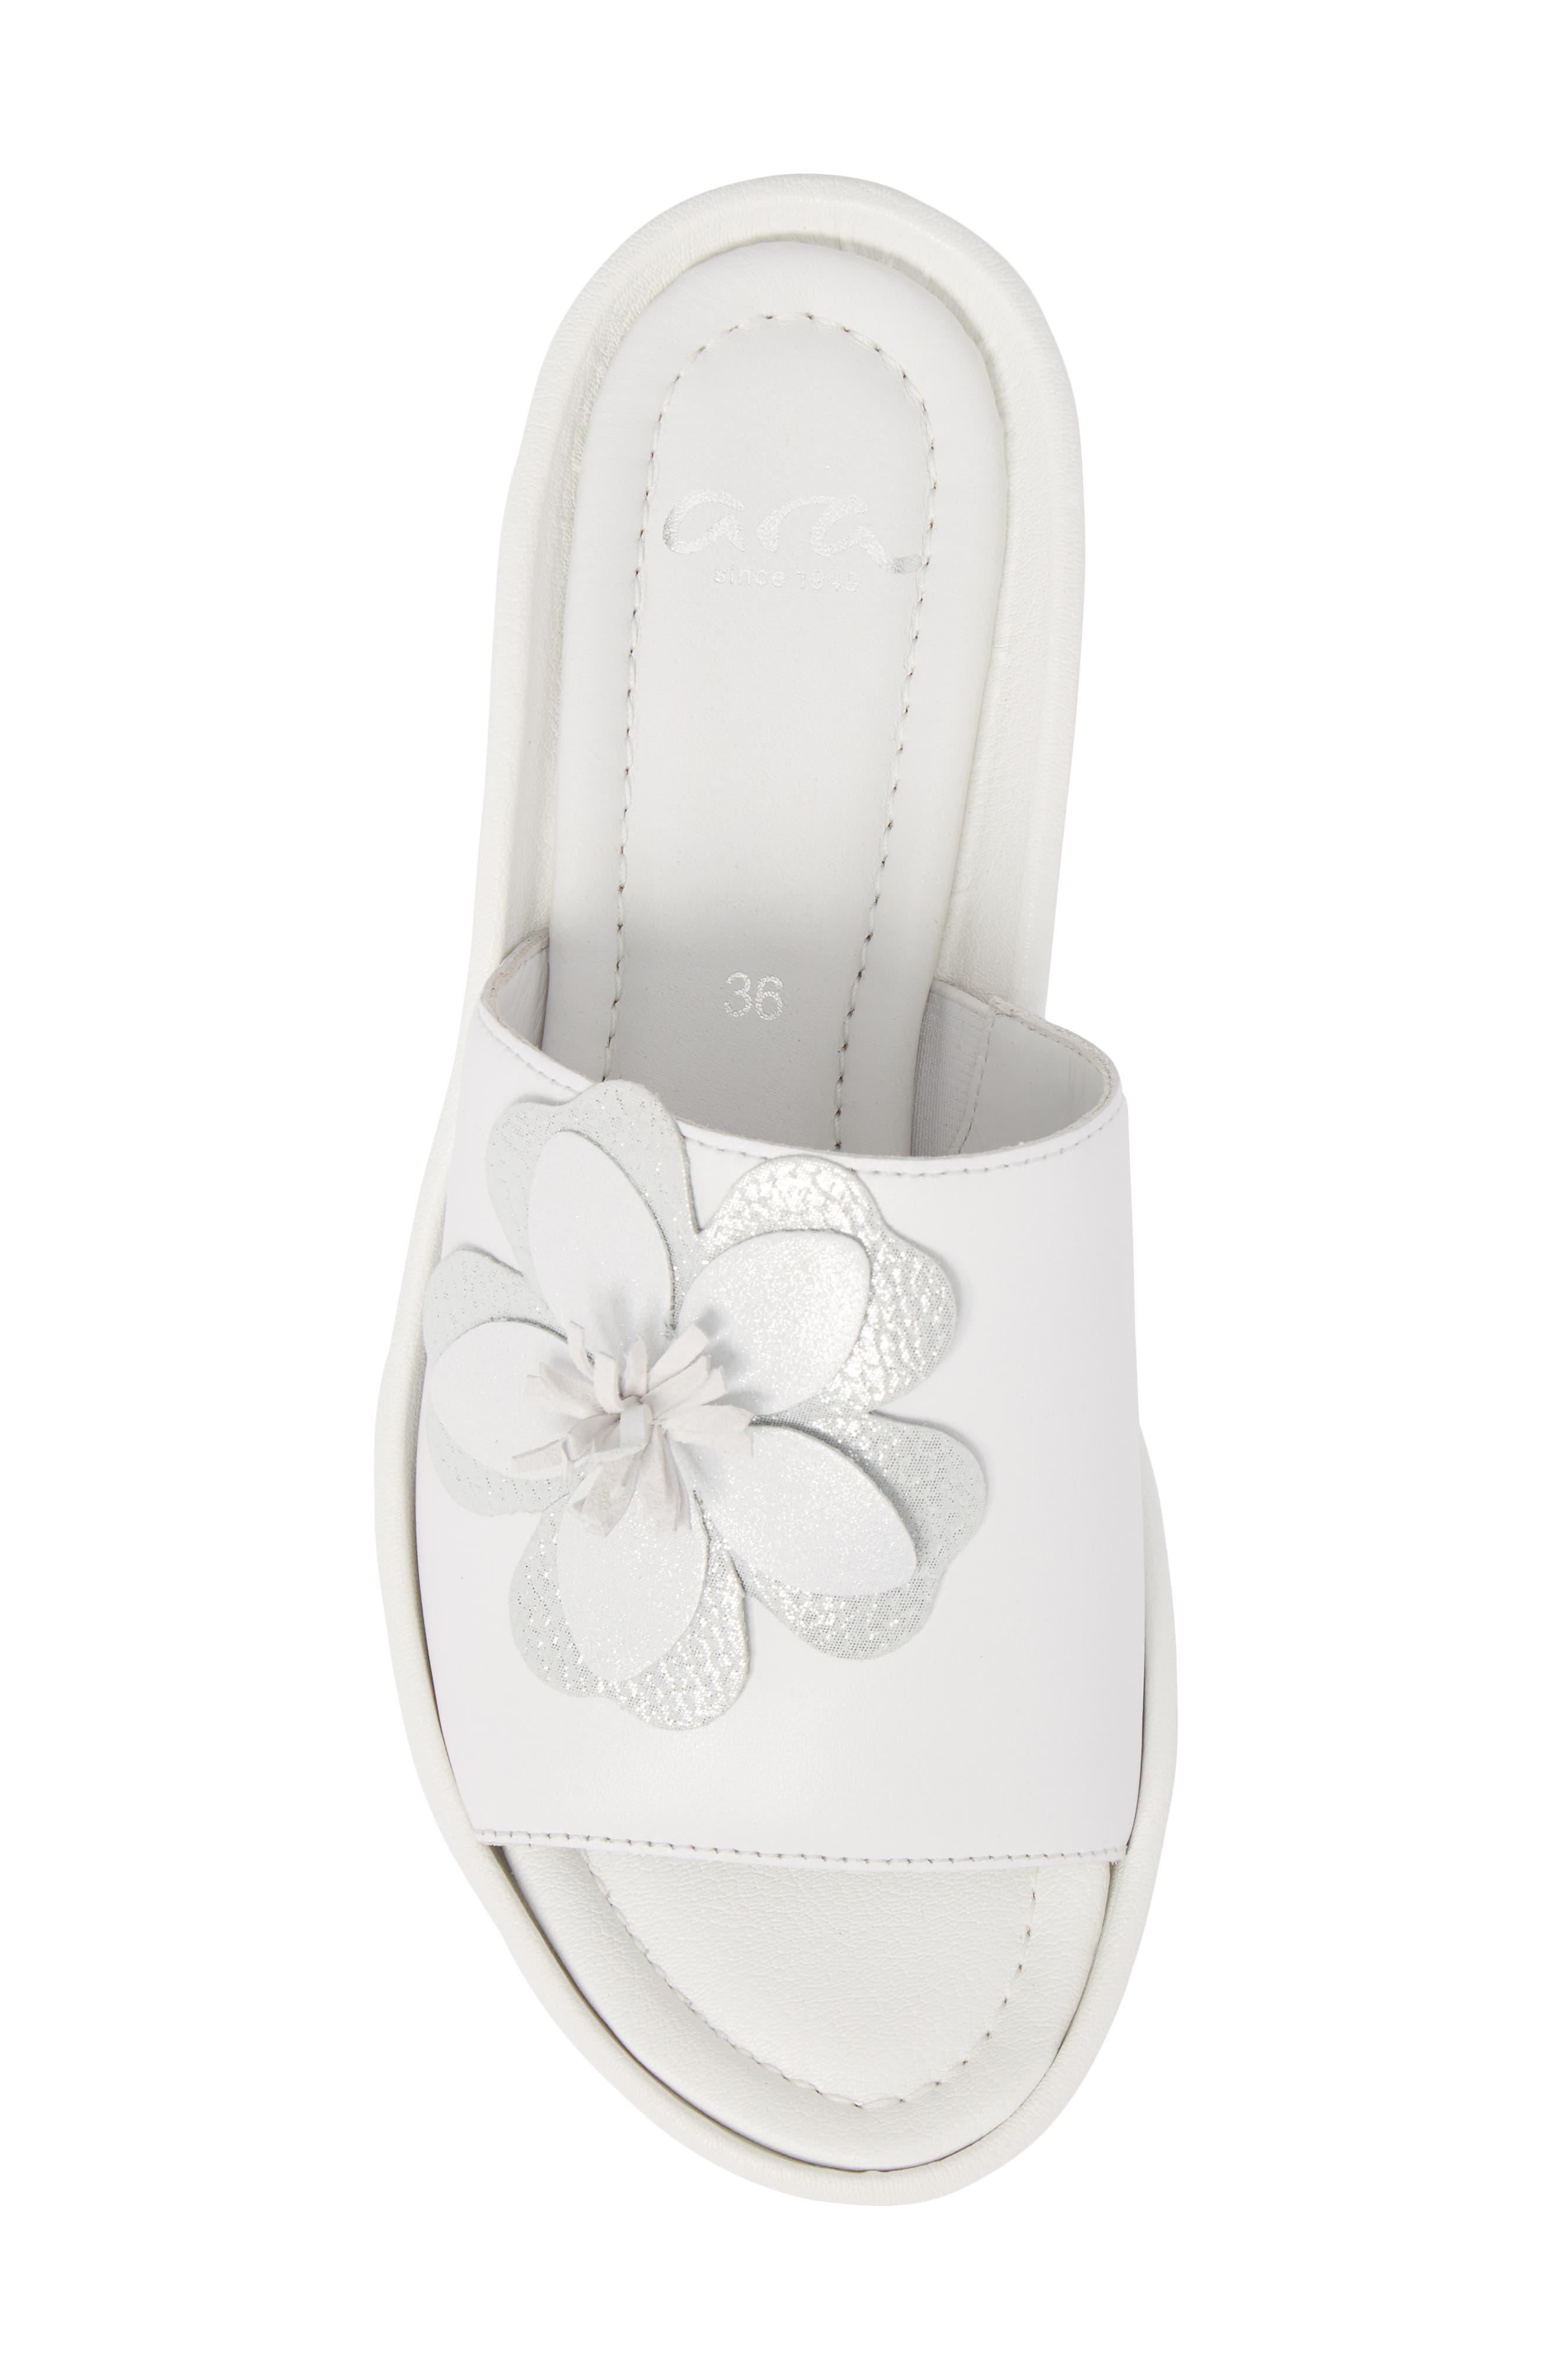 Thea Wedge Slide Sandal,                             Alternate thumbnail 5, color,                             WHITE LEATHER